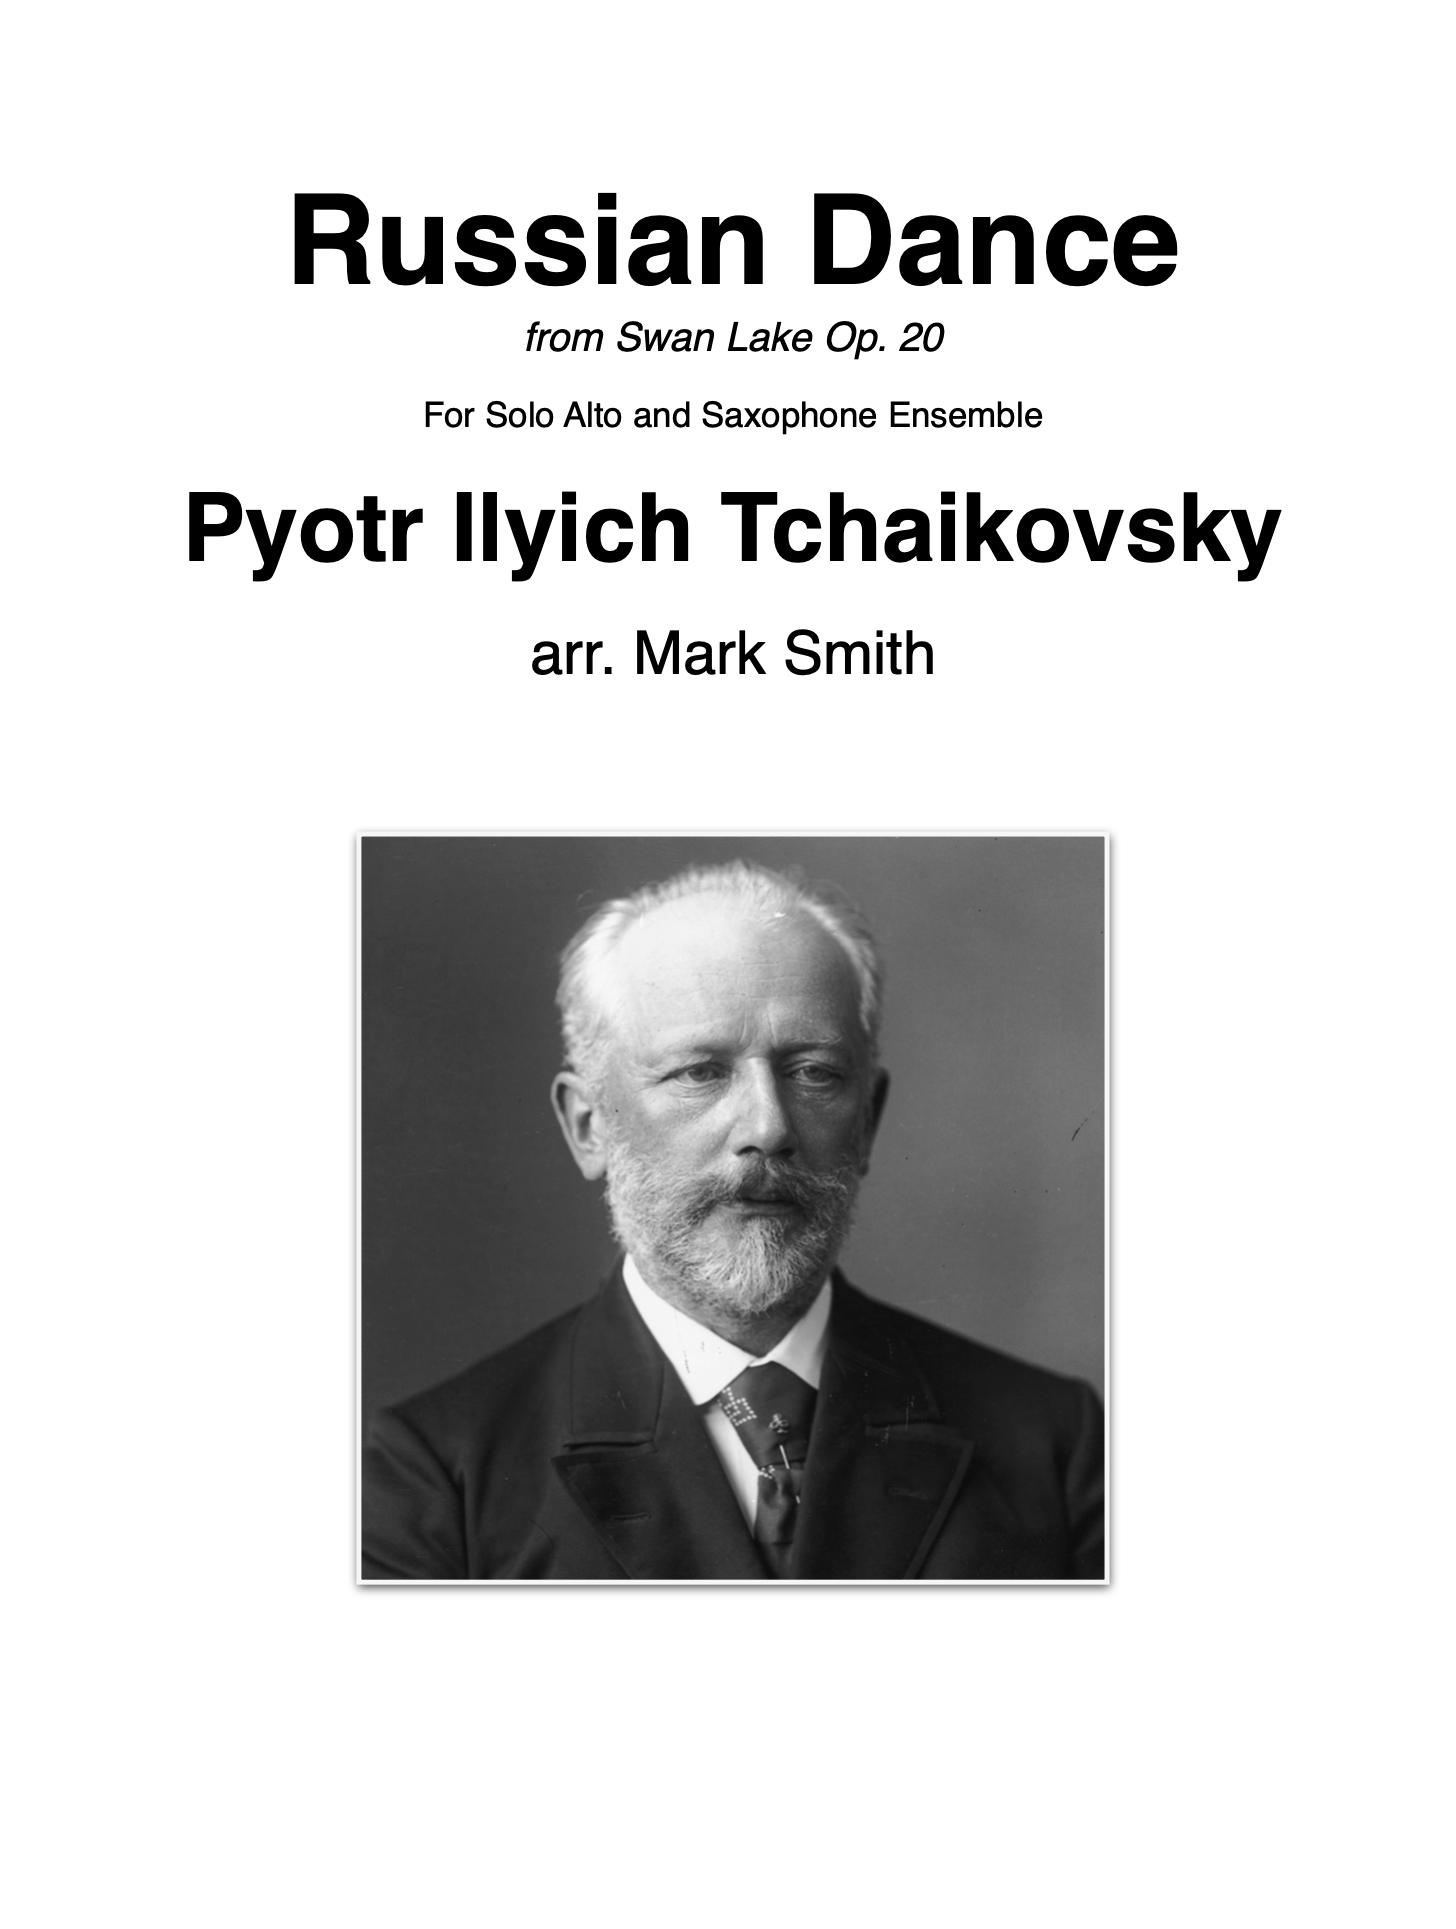 Russian Dance by Tchaikovsky, arr. Mark Smith